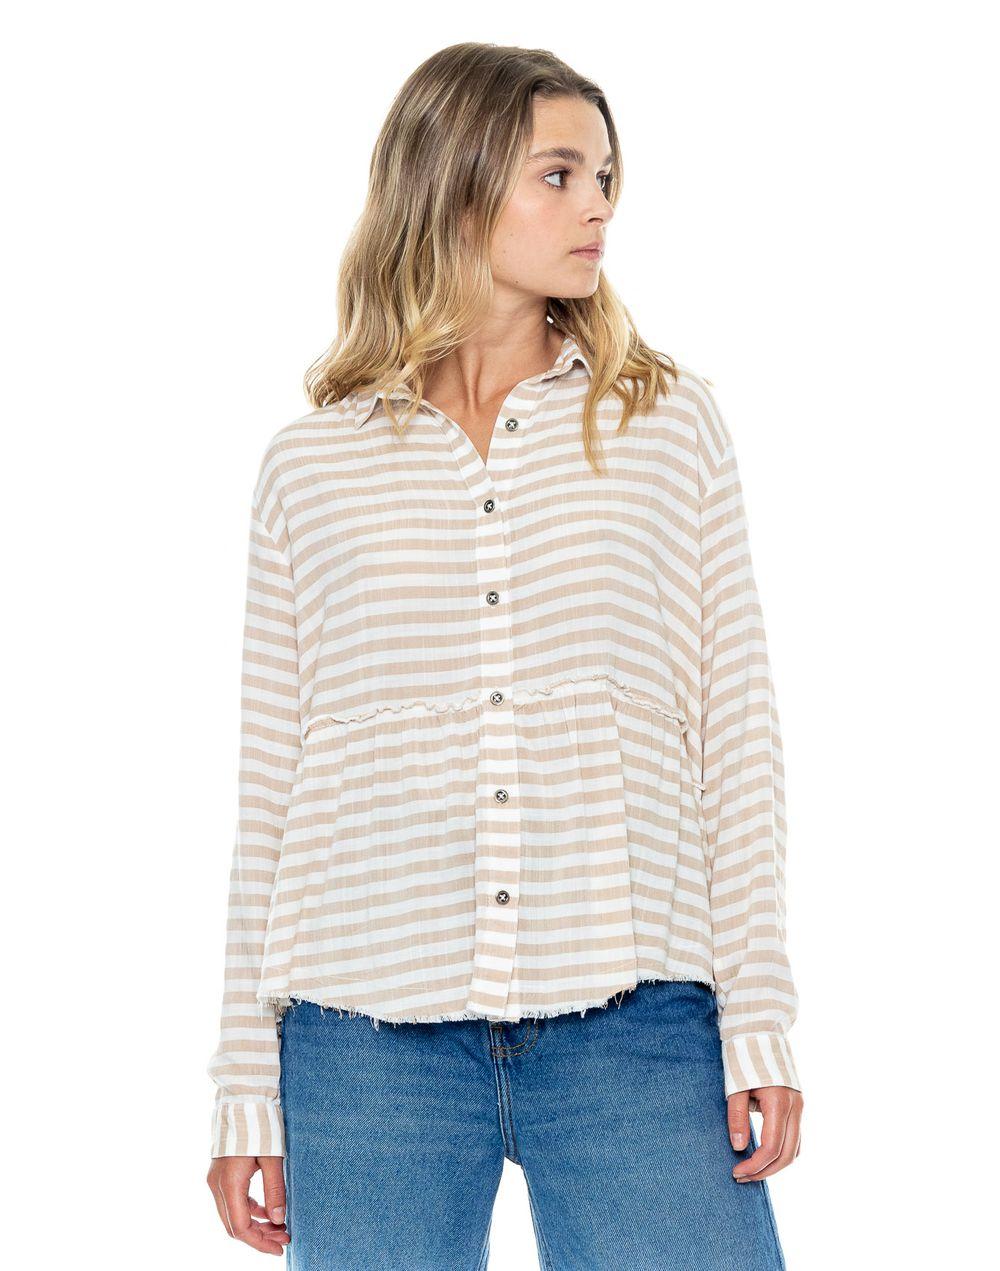 camisa-044605-rosado-3.jpg